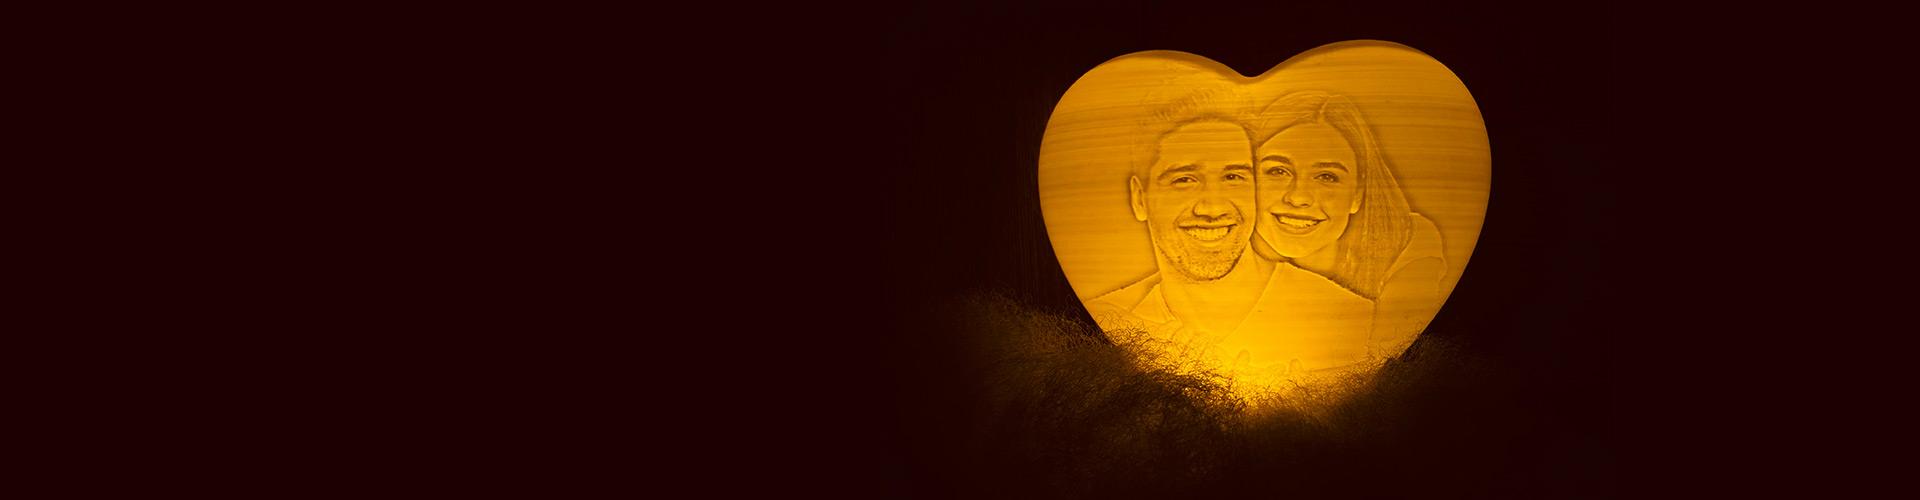 Heart-Shaped Photo Lamp